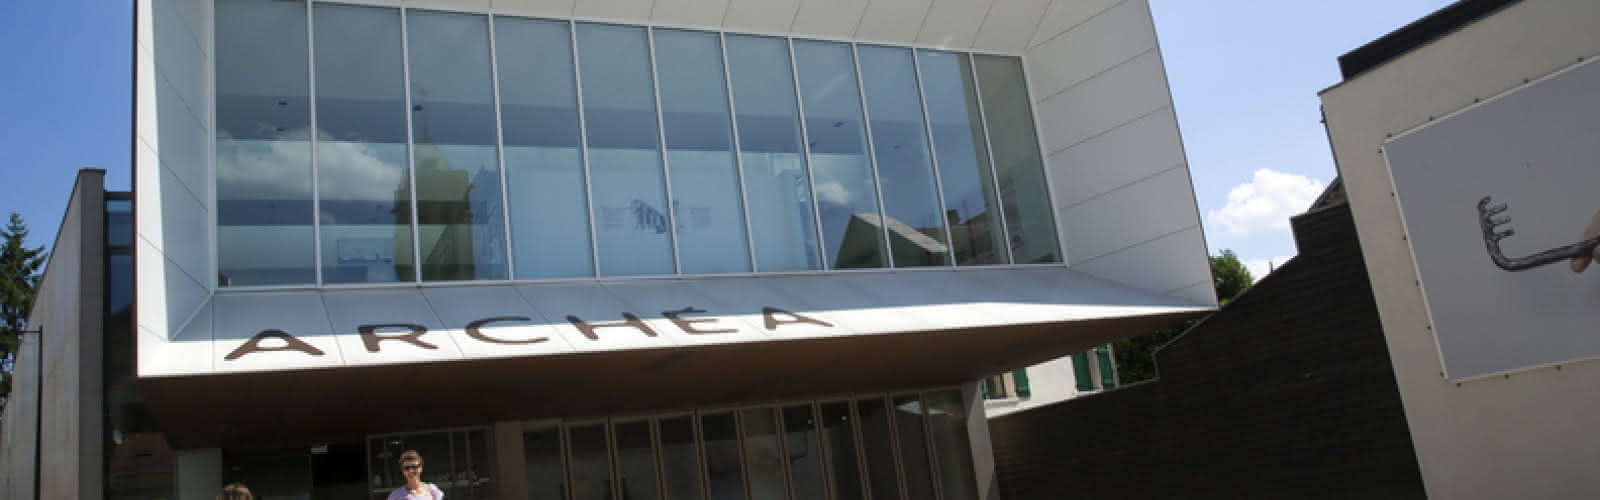 Façade ARCHEA 2013